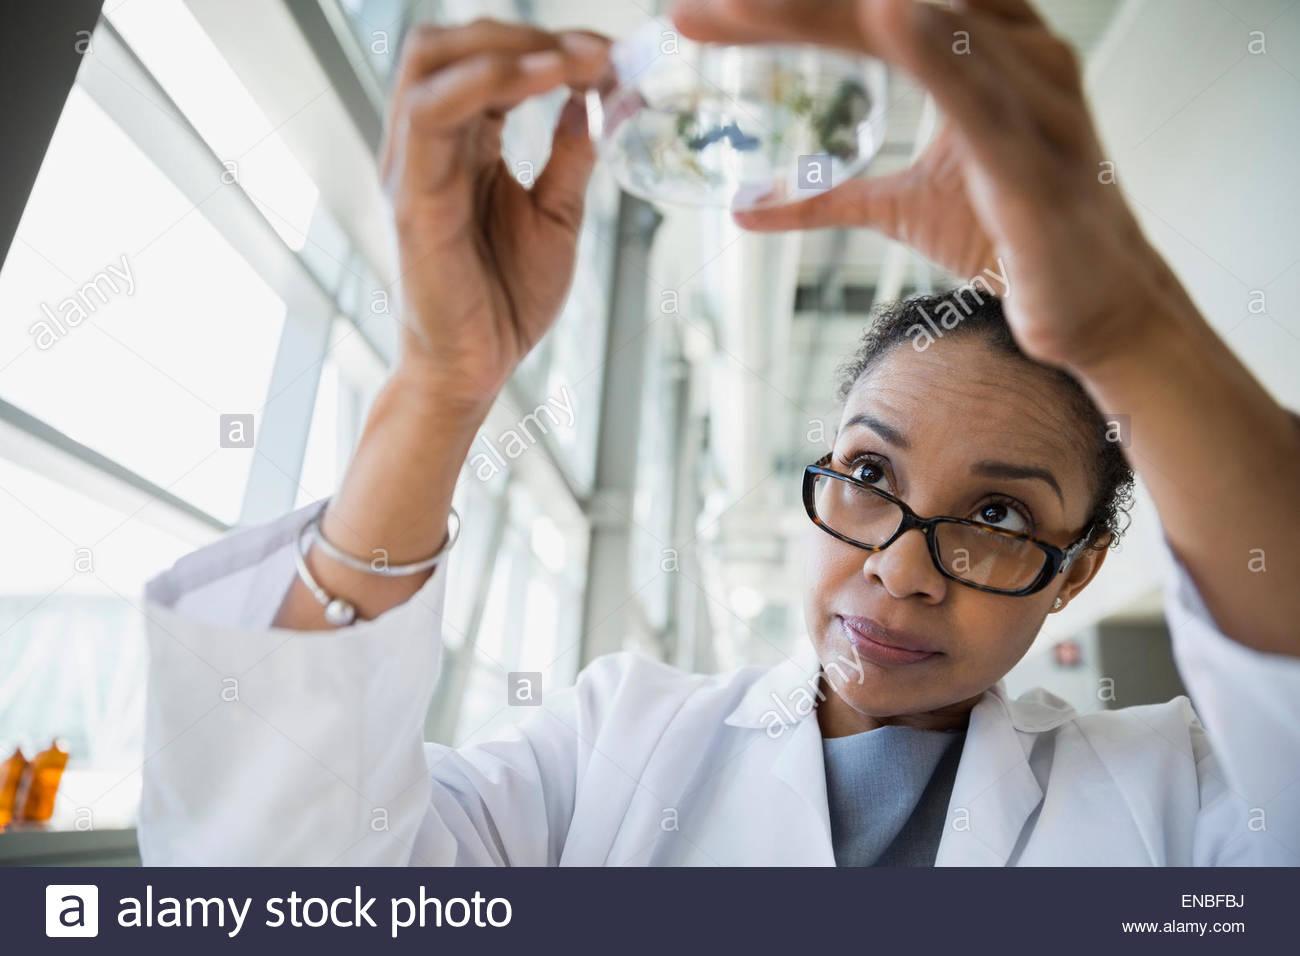 Scientist examining petri dish - Stock Image